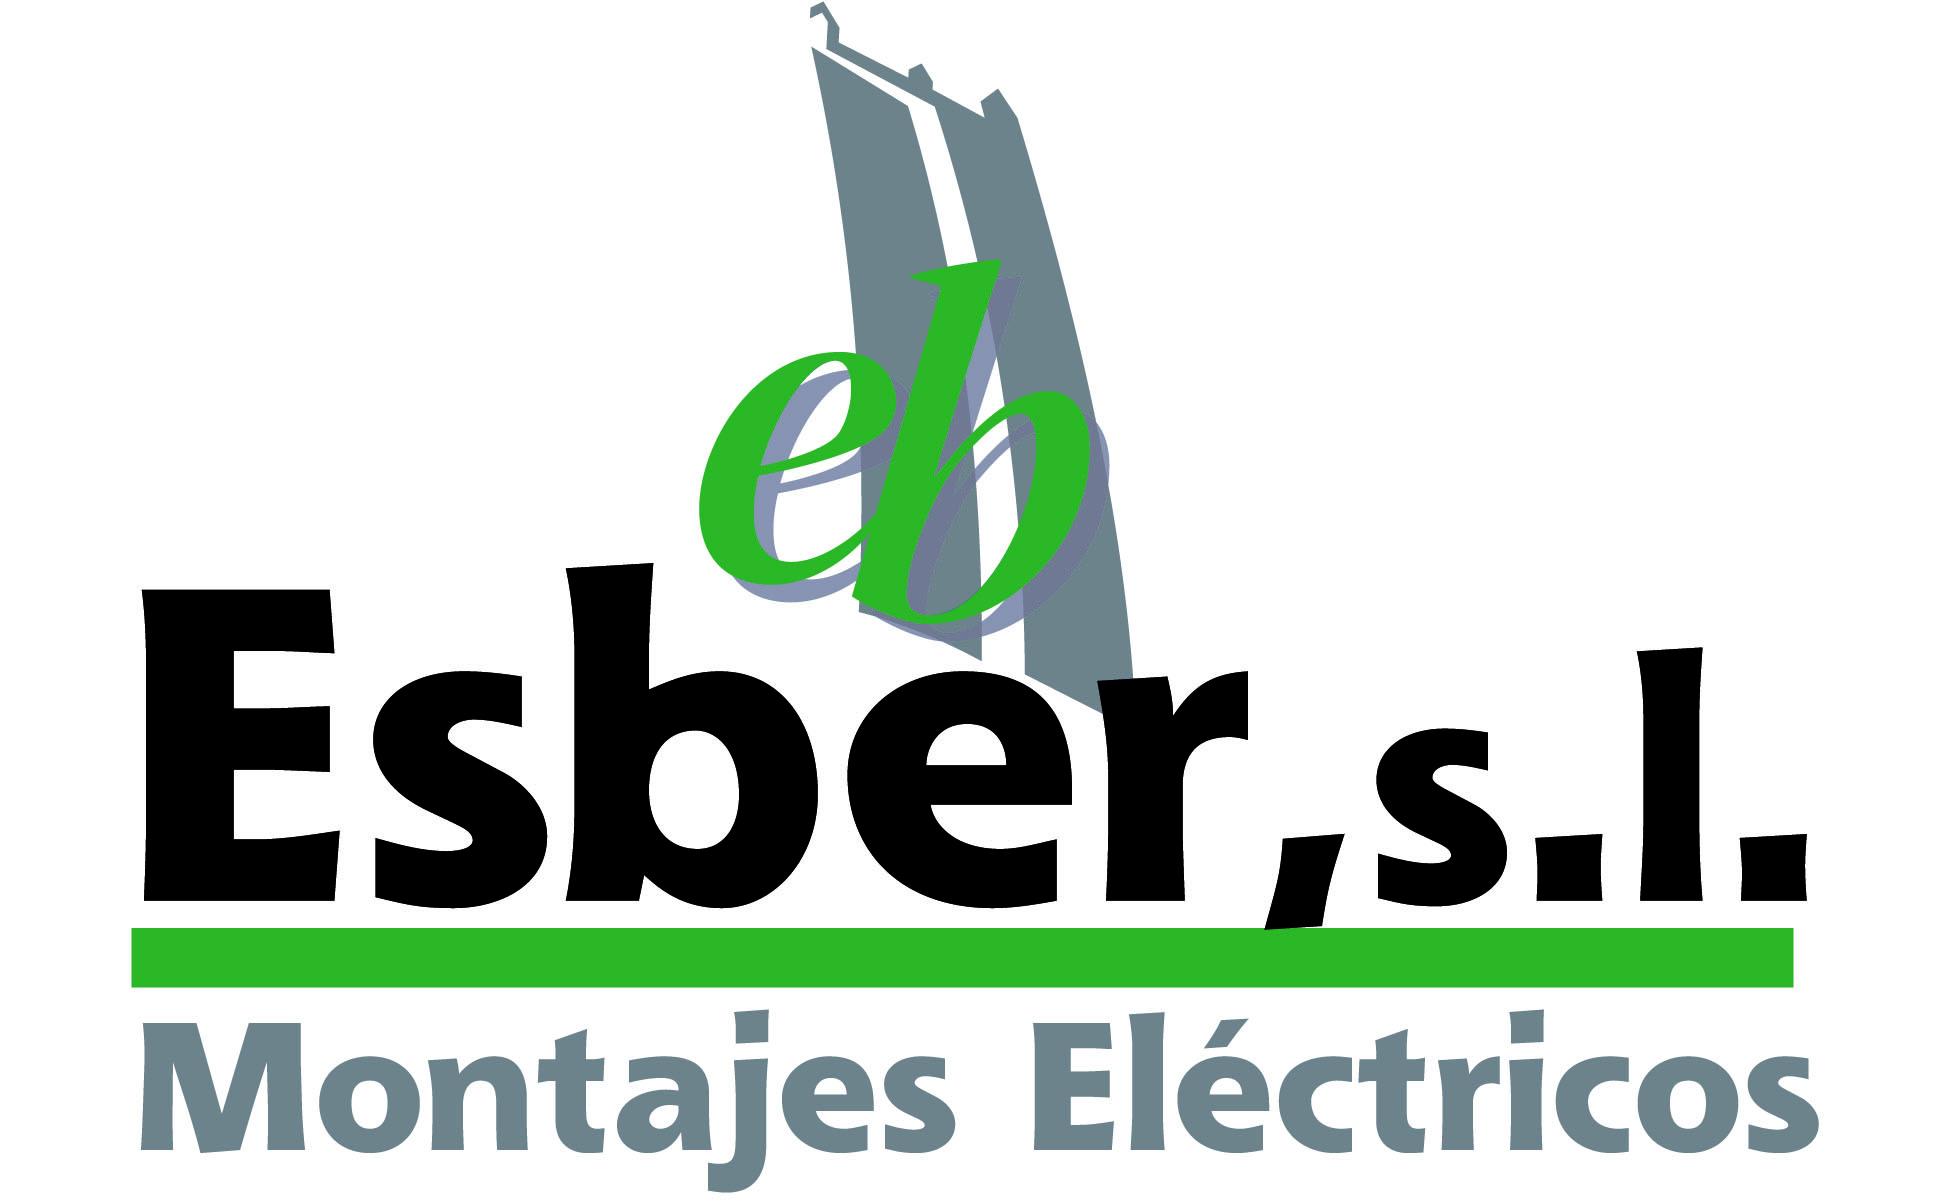 ESBER logo completo - Montajes Eléctricos Esber